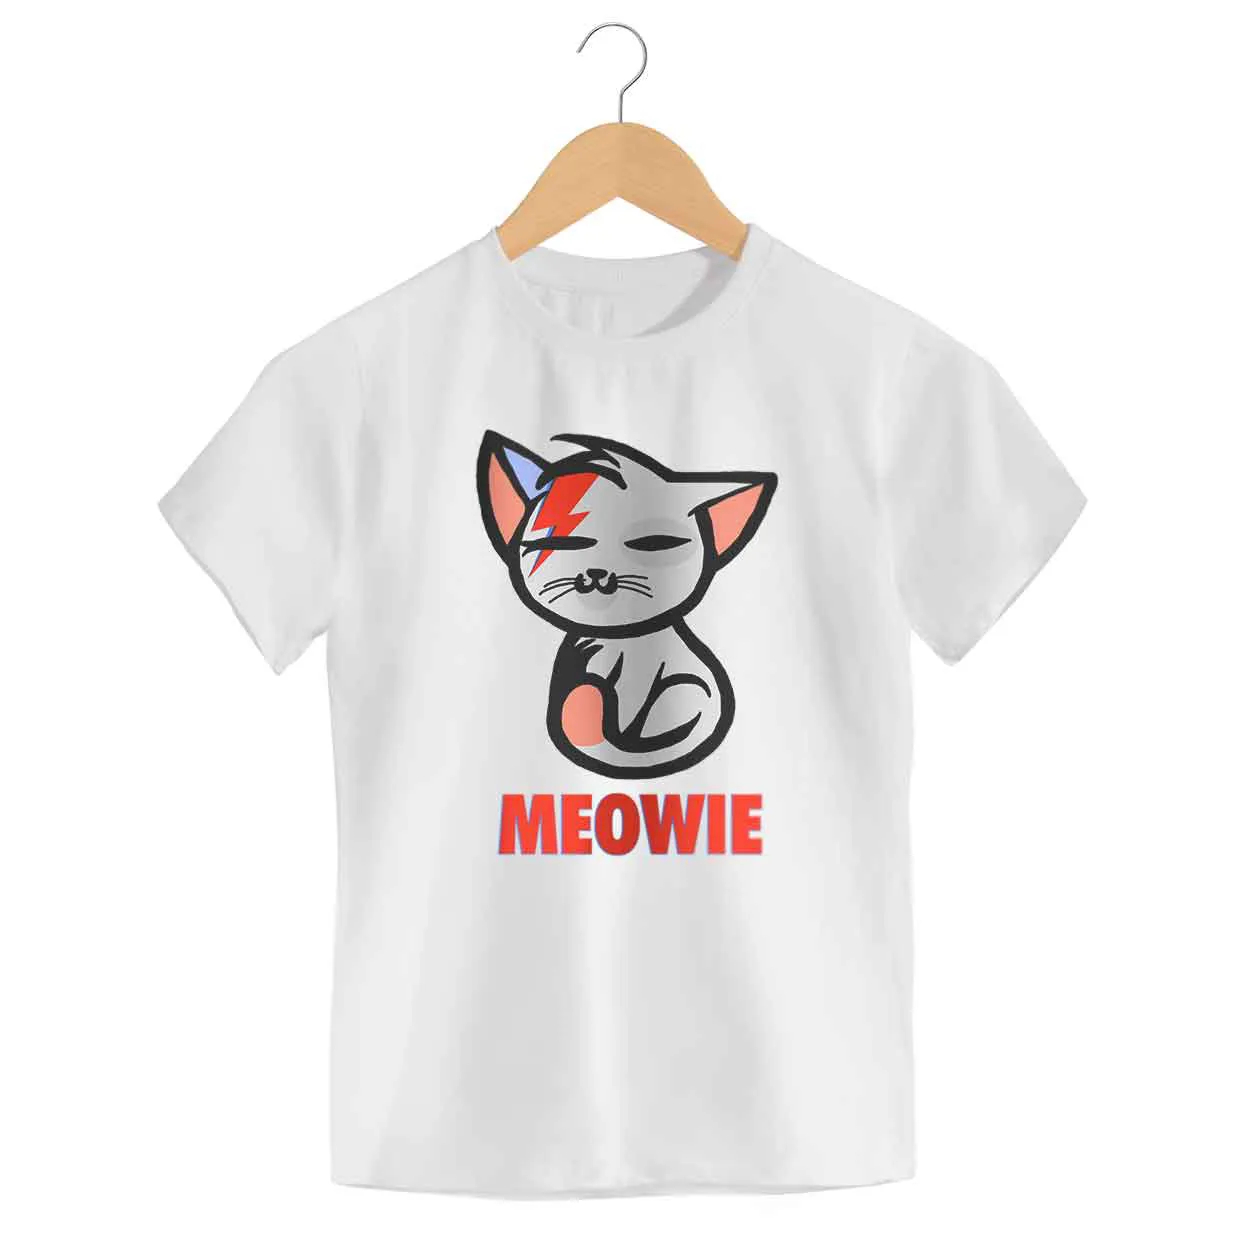 Camiseta Meowie - Infantil